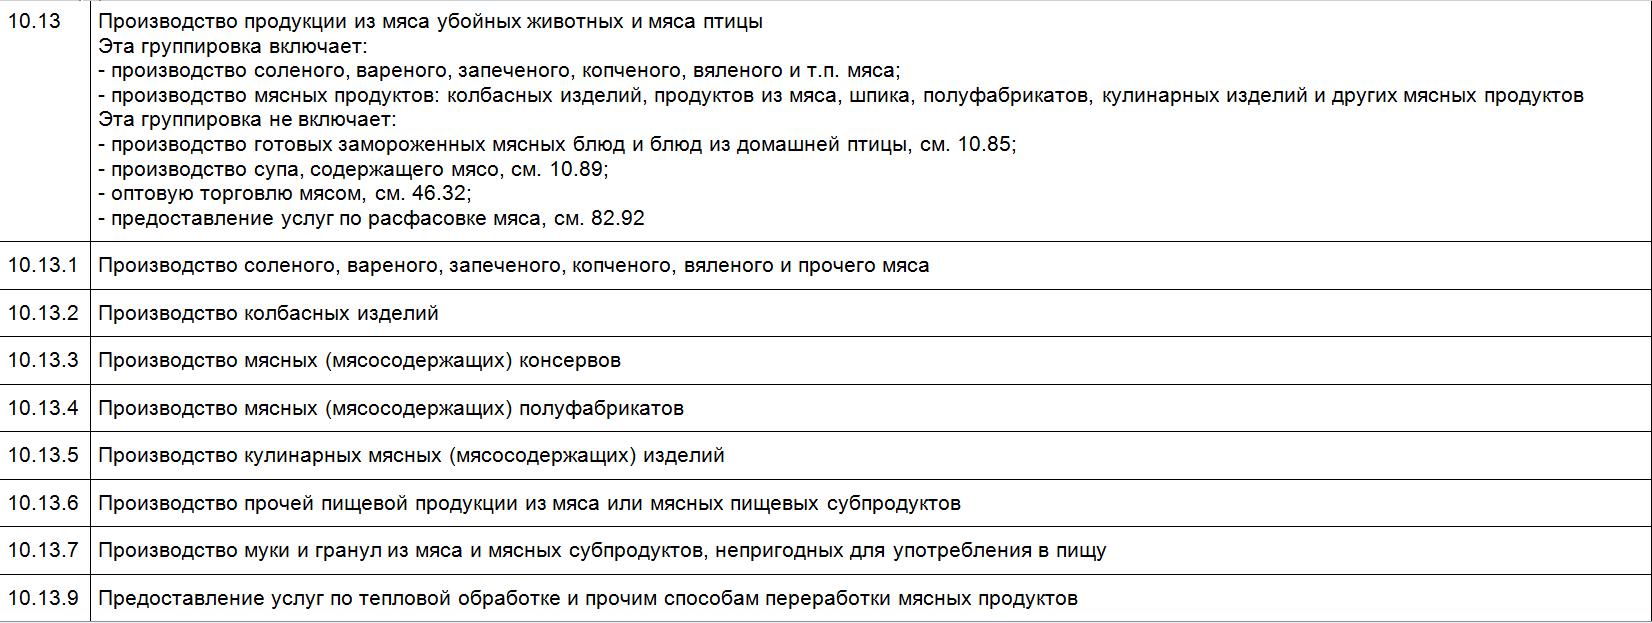 ОКВЭД 10.13